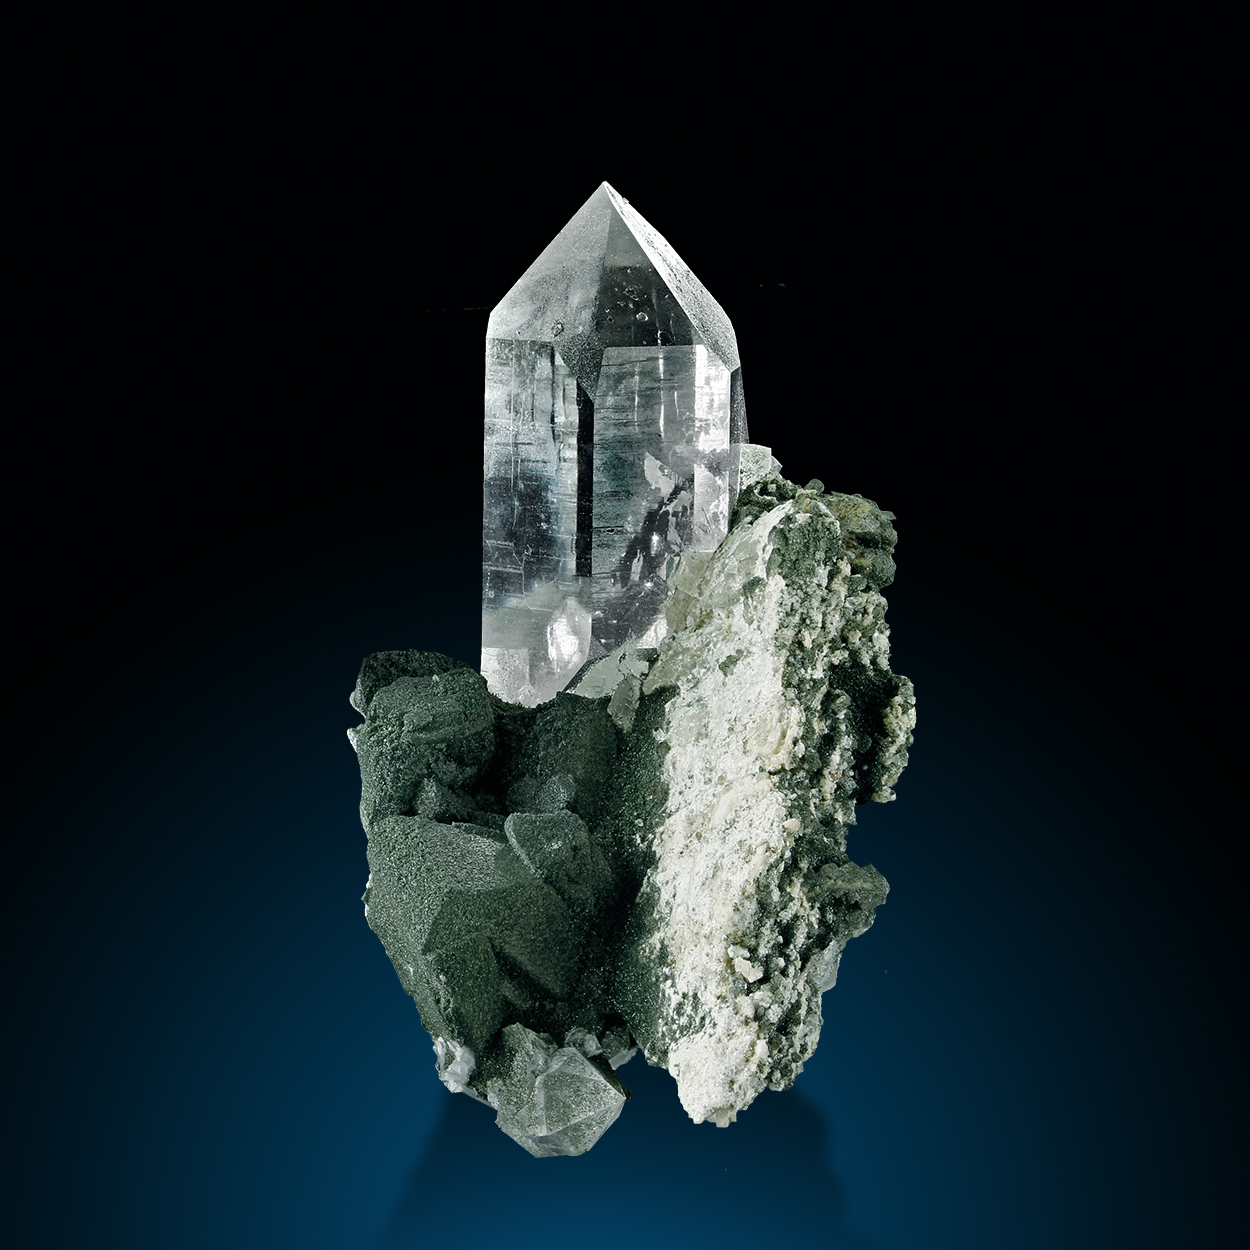 Rock Crystal Adularia & Chlorite